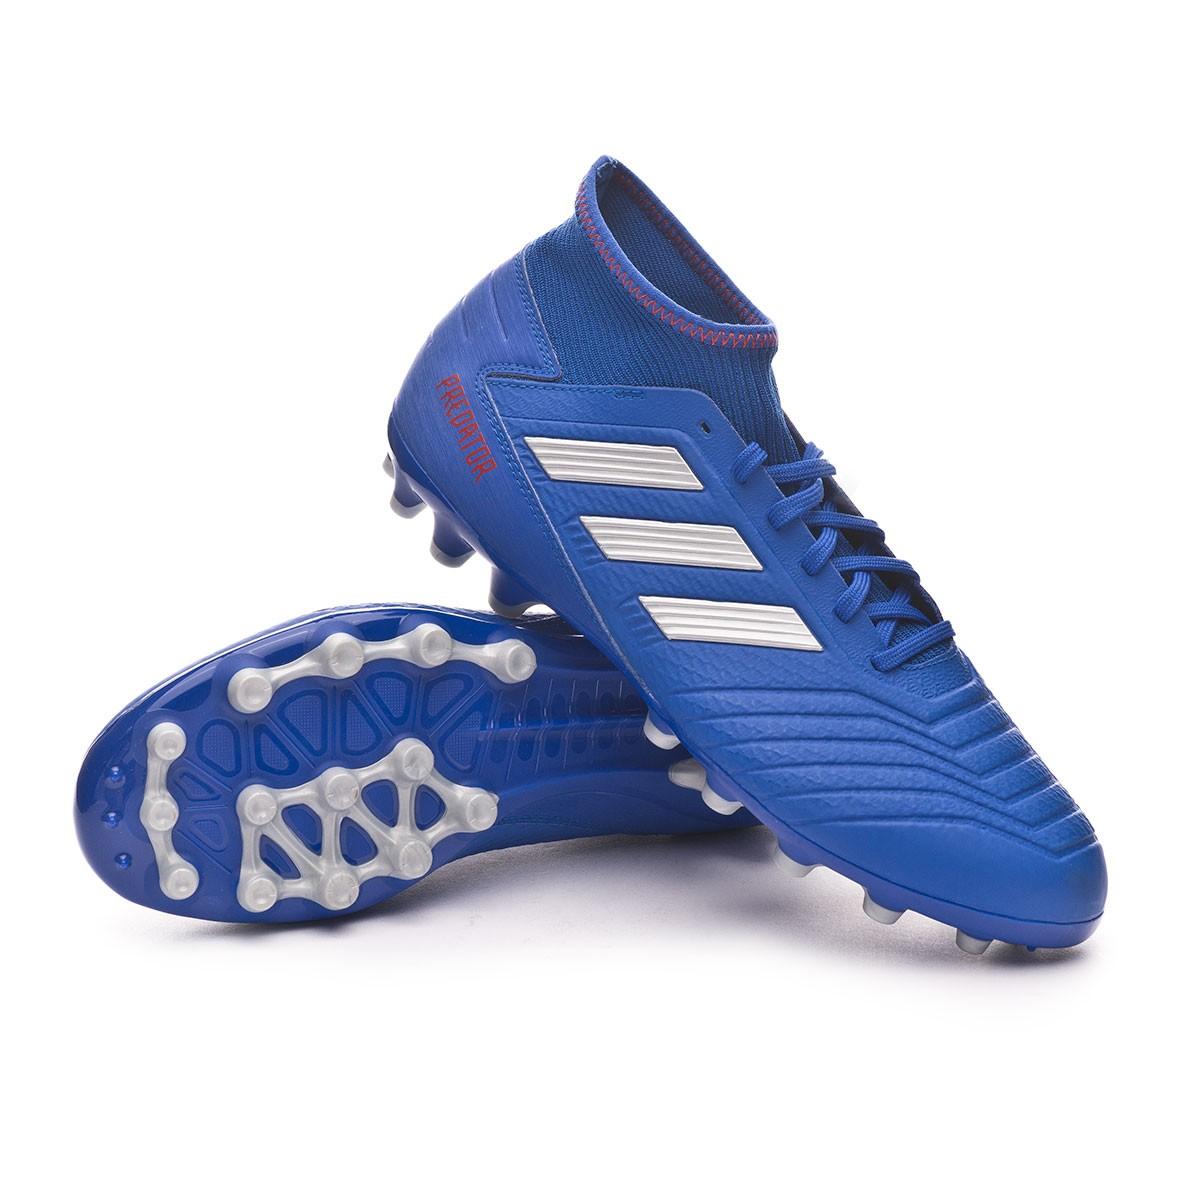 Chaussure de foot adidas Predator 19.3 AG